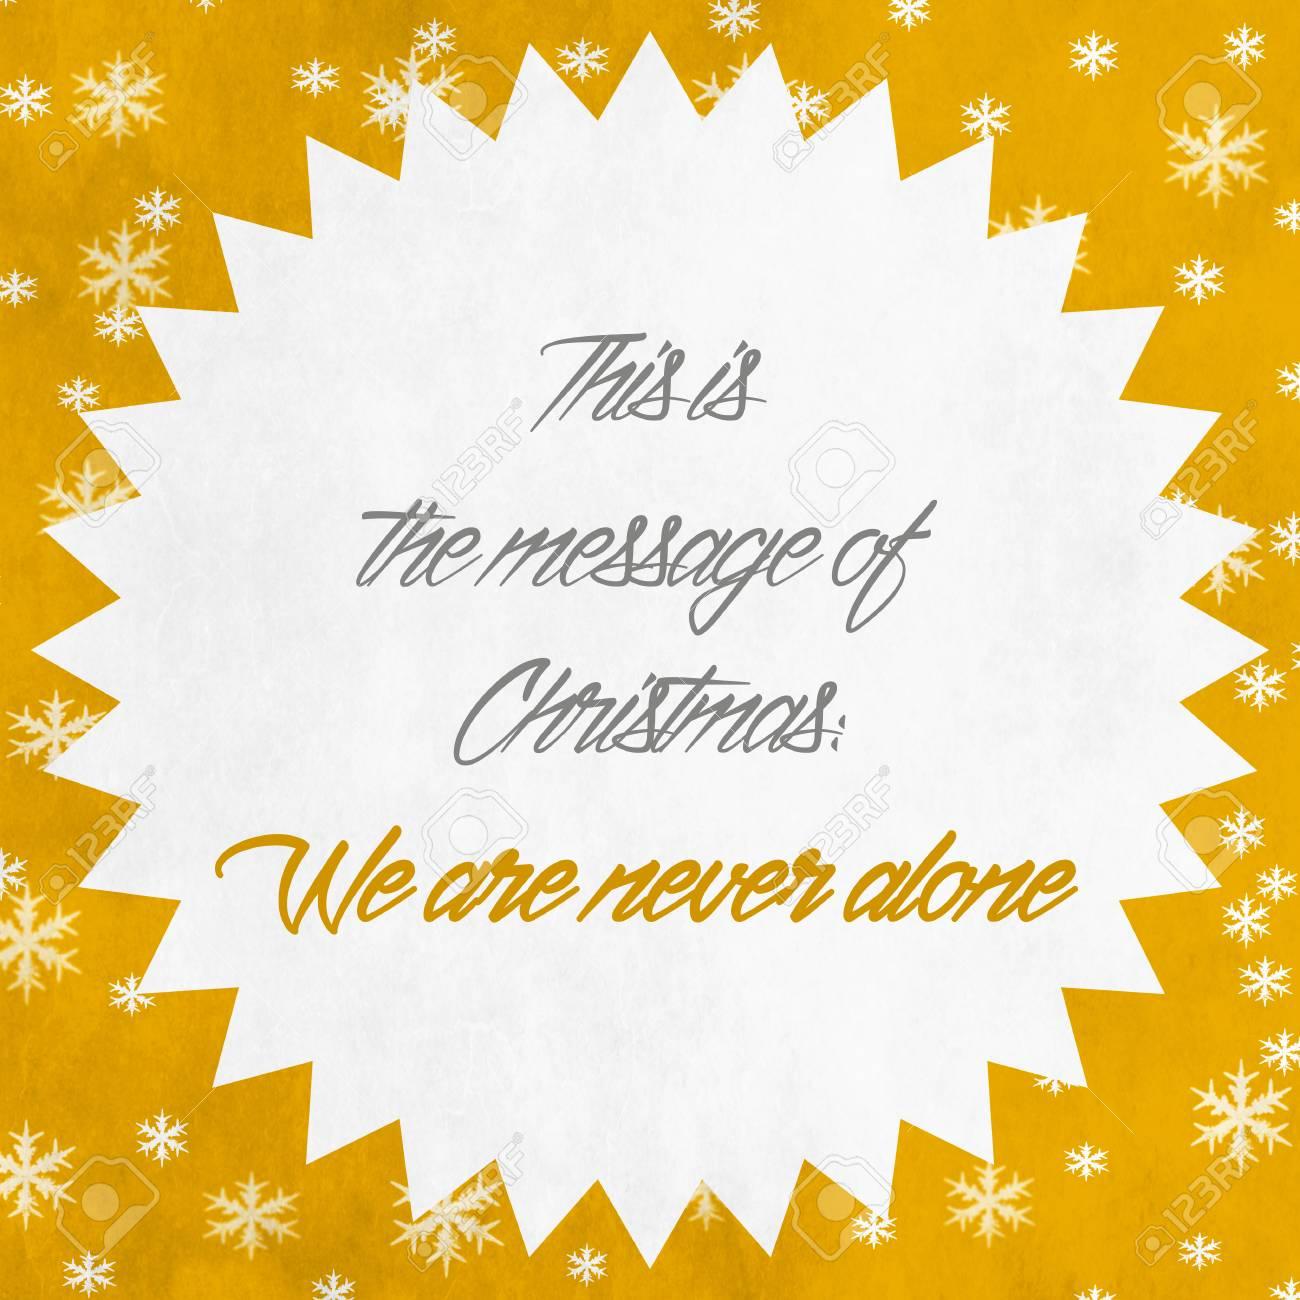 Merry christmas season greetings quote stock photo picture and merry christmas season greetings quote stock photo 34123164 m4hsunfo